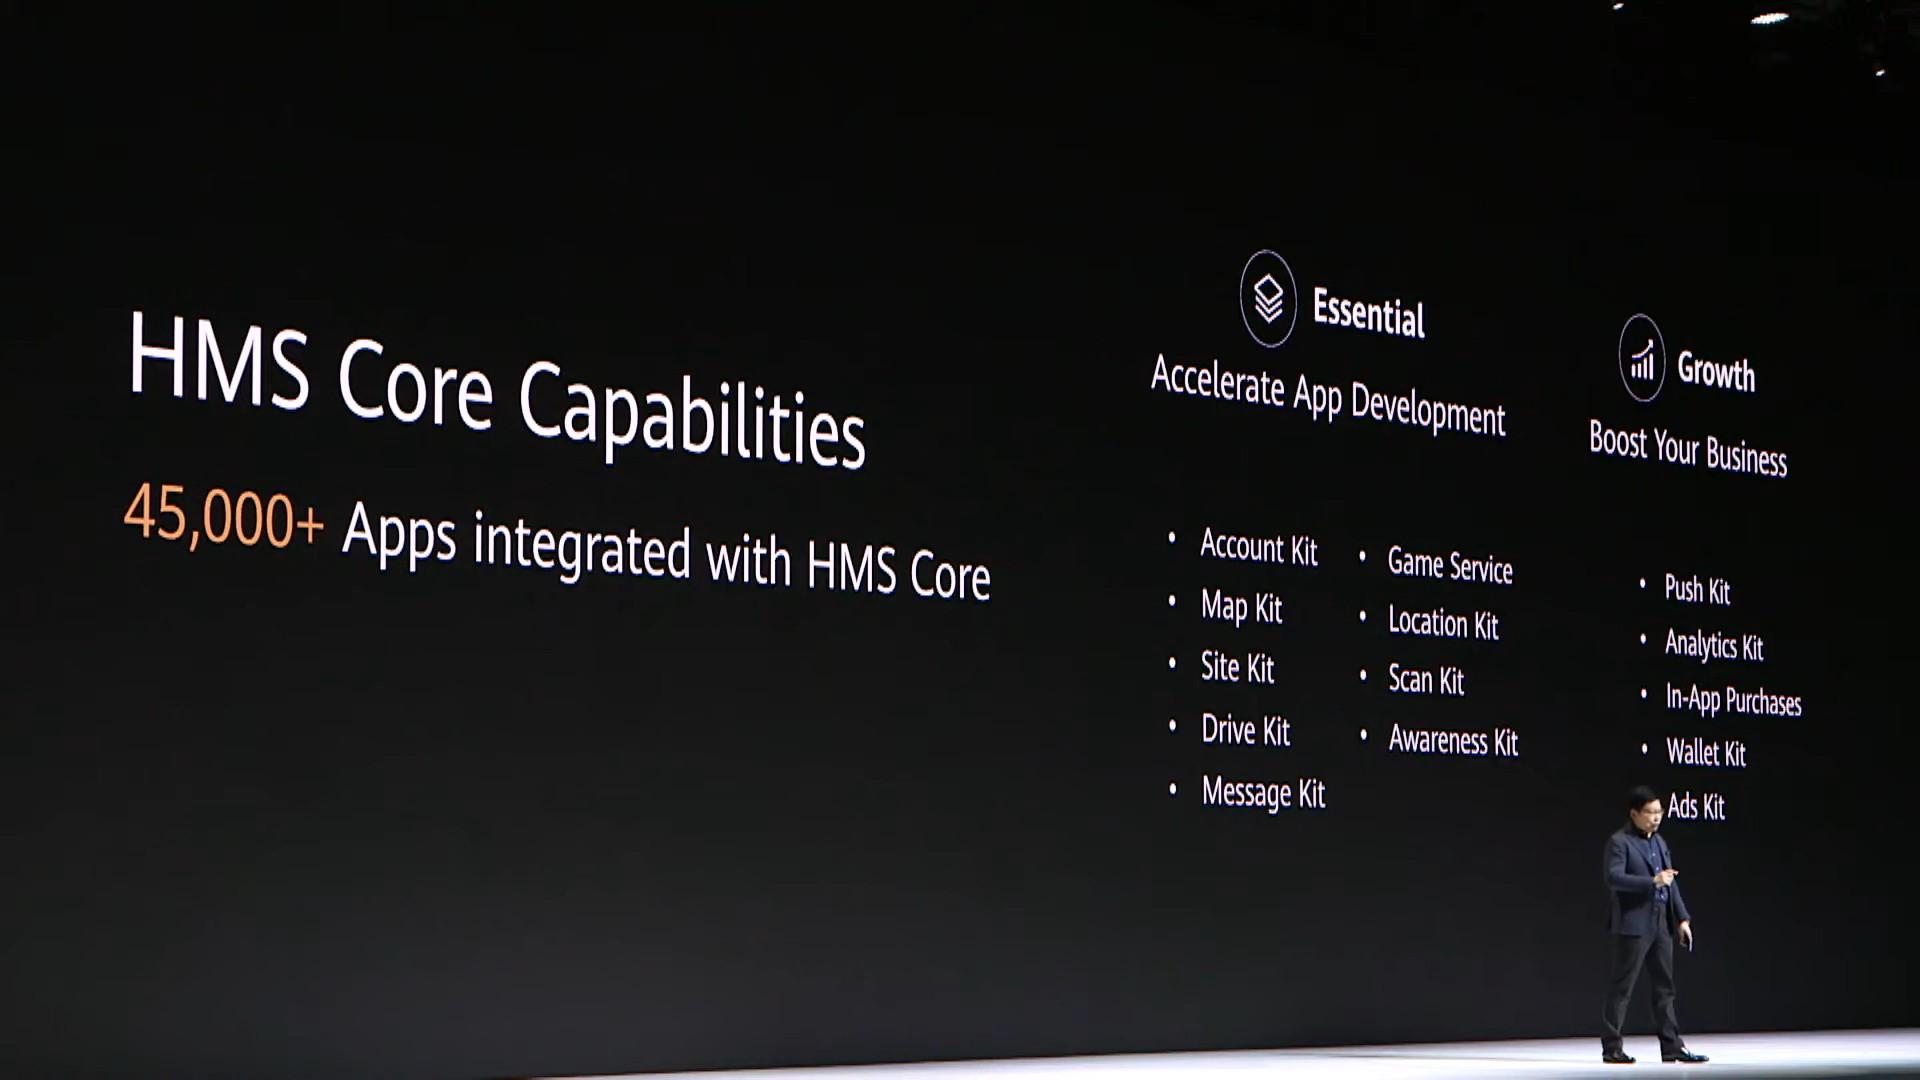 Huawei,Mate 30,Mate 30 Pro,Mate 30 RS Porsche Design,Mate30,Mate30Pro,Mate30RS,Porsche Design,...jpg